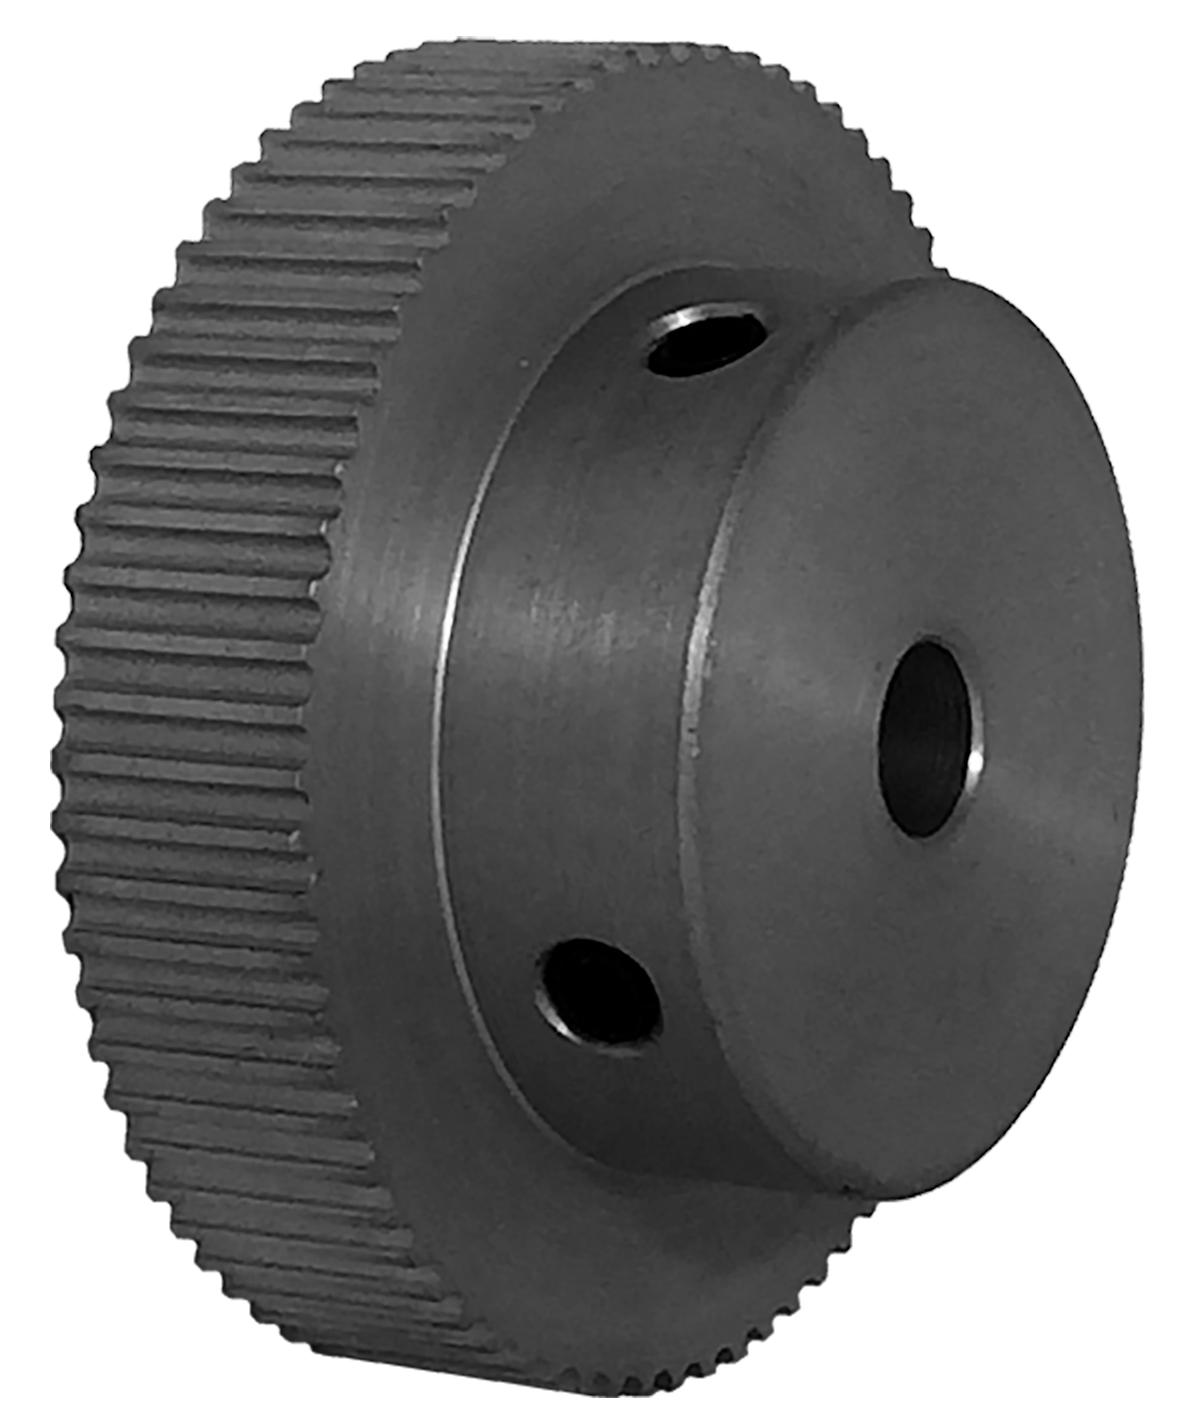 72-2P06-6A3 - Aluminum Powerhouse® Pulleys